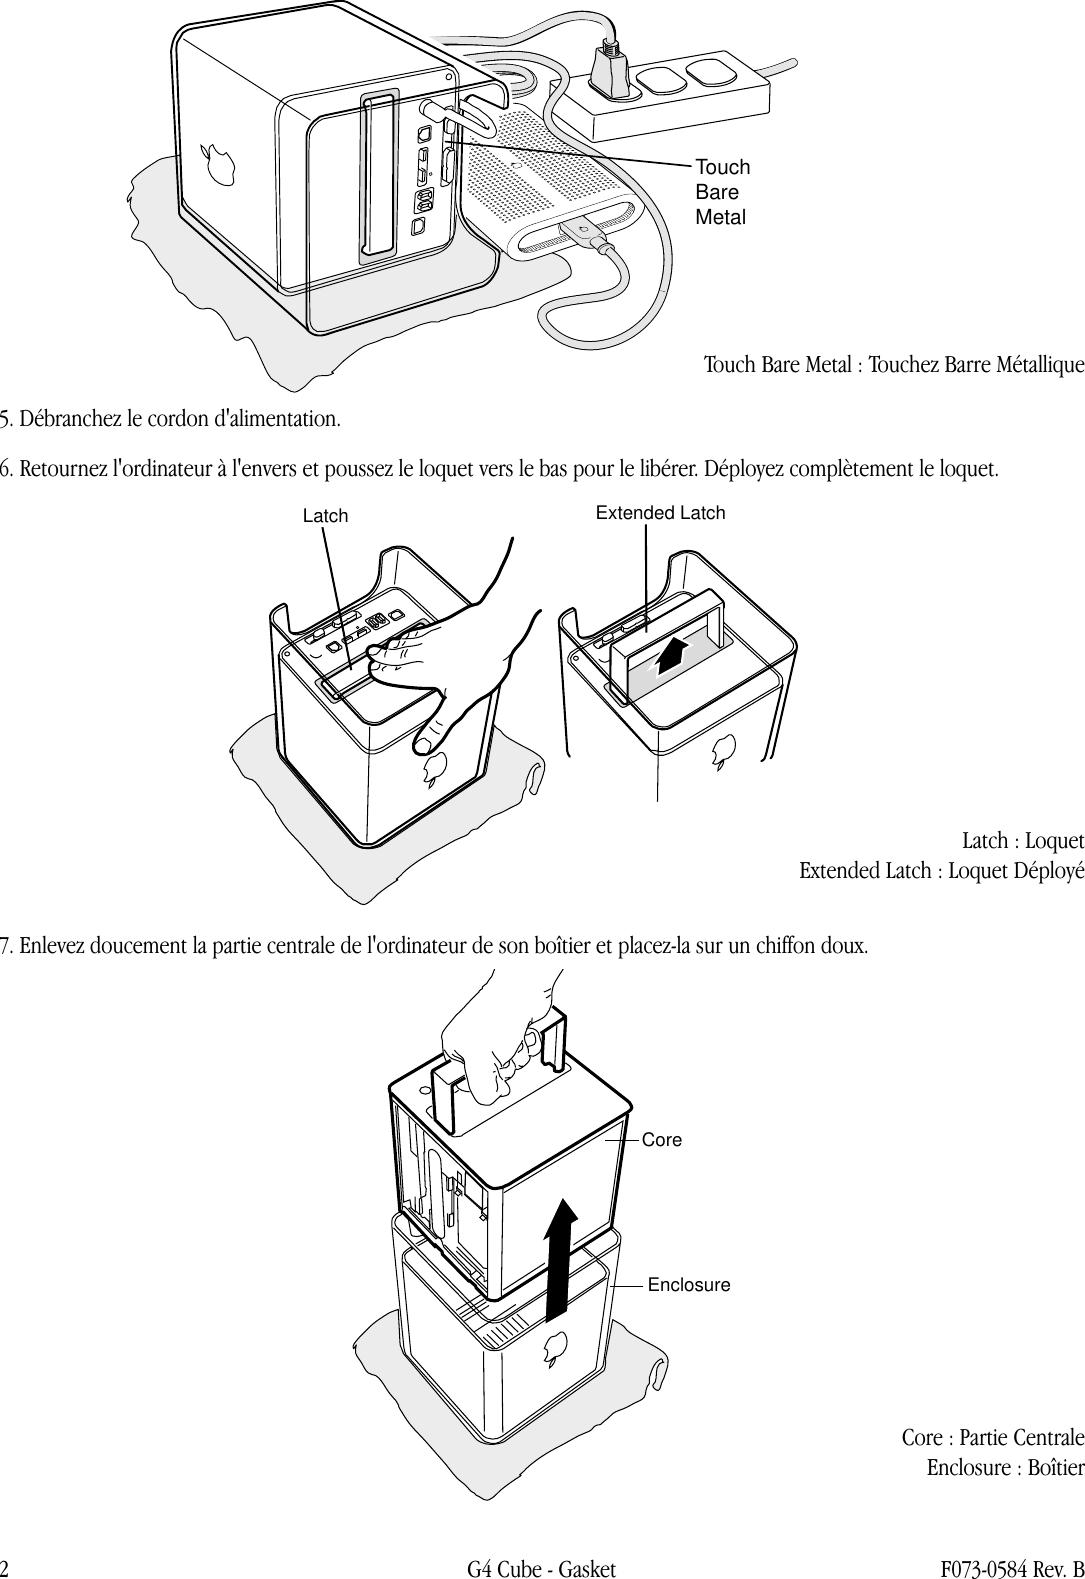 Apple Power Mac G4(Cube) Gasket User Manual Power Mac G4